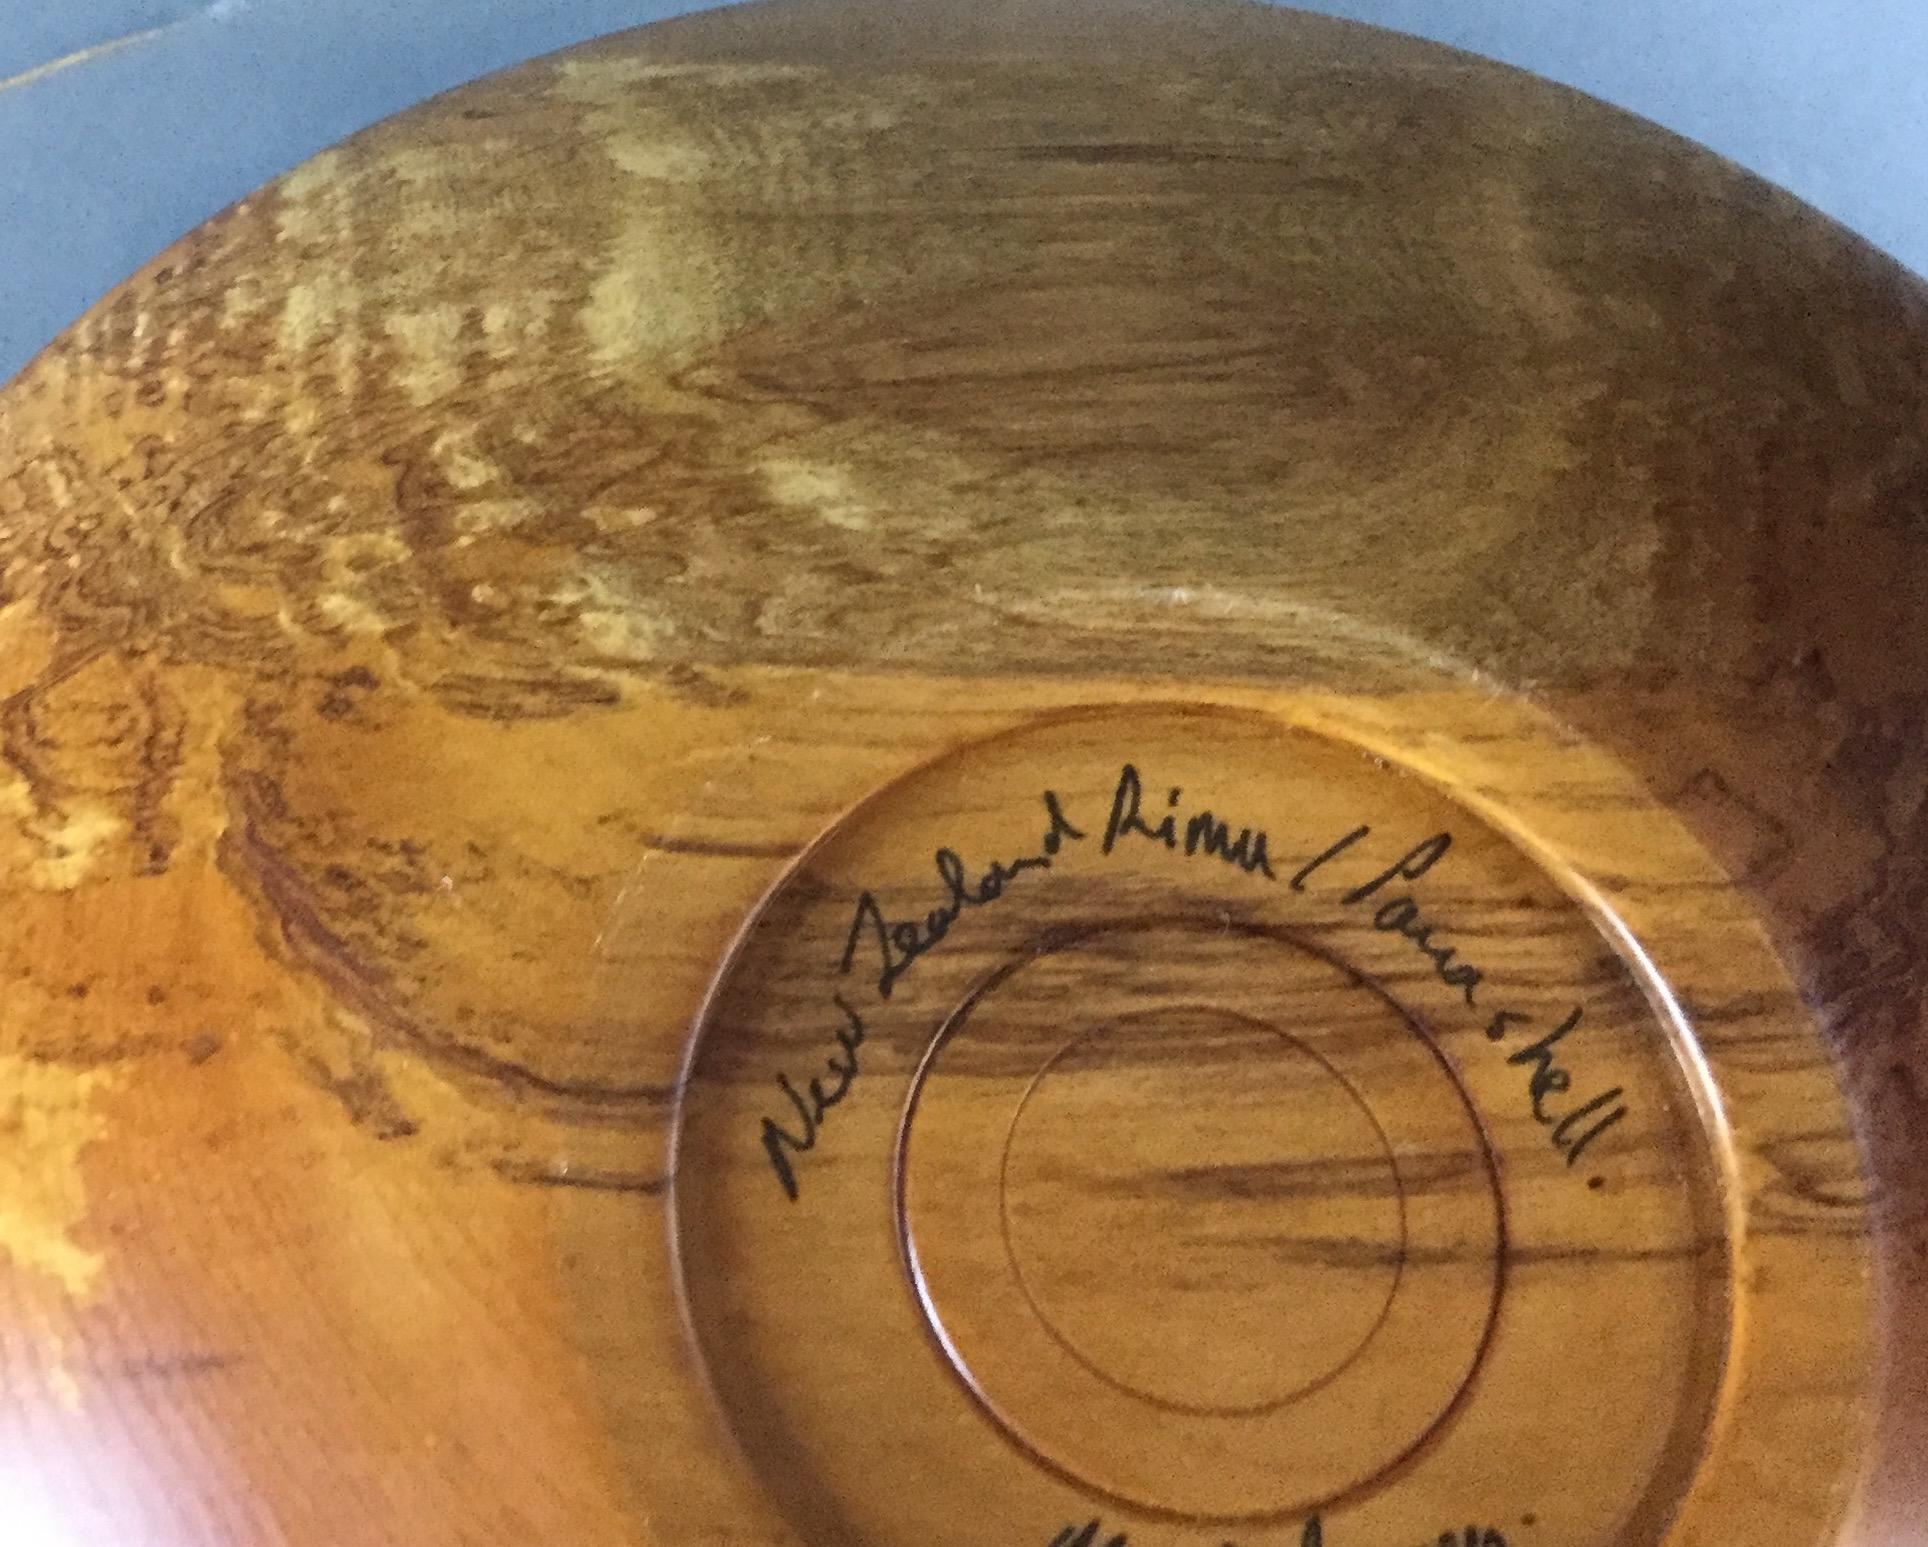 Turned-Wood-Bowl-from-New-Zealand_60843K.jpg